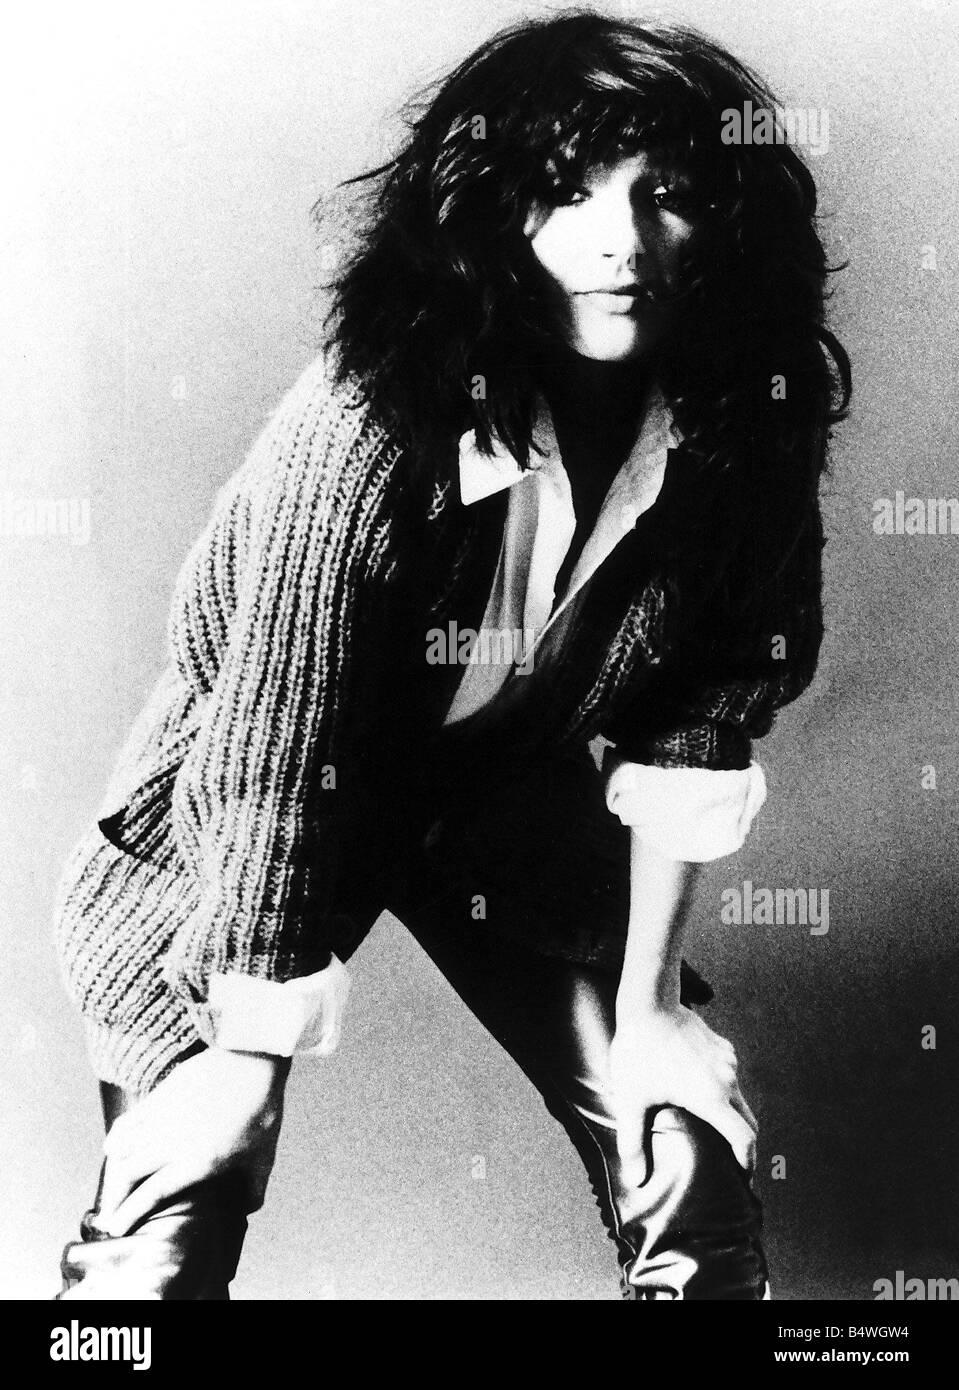 Pop singer Kate Bush poses in the studio September 1982 - Stock Image